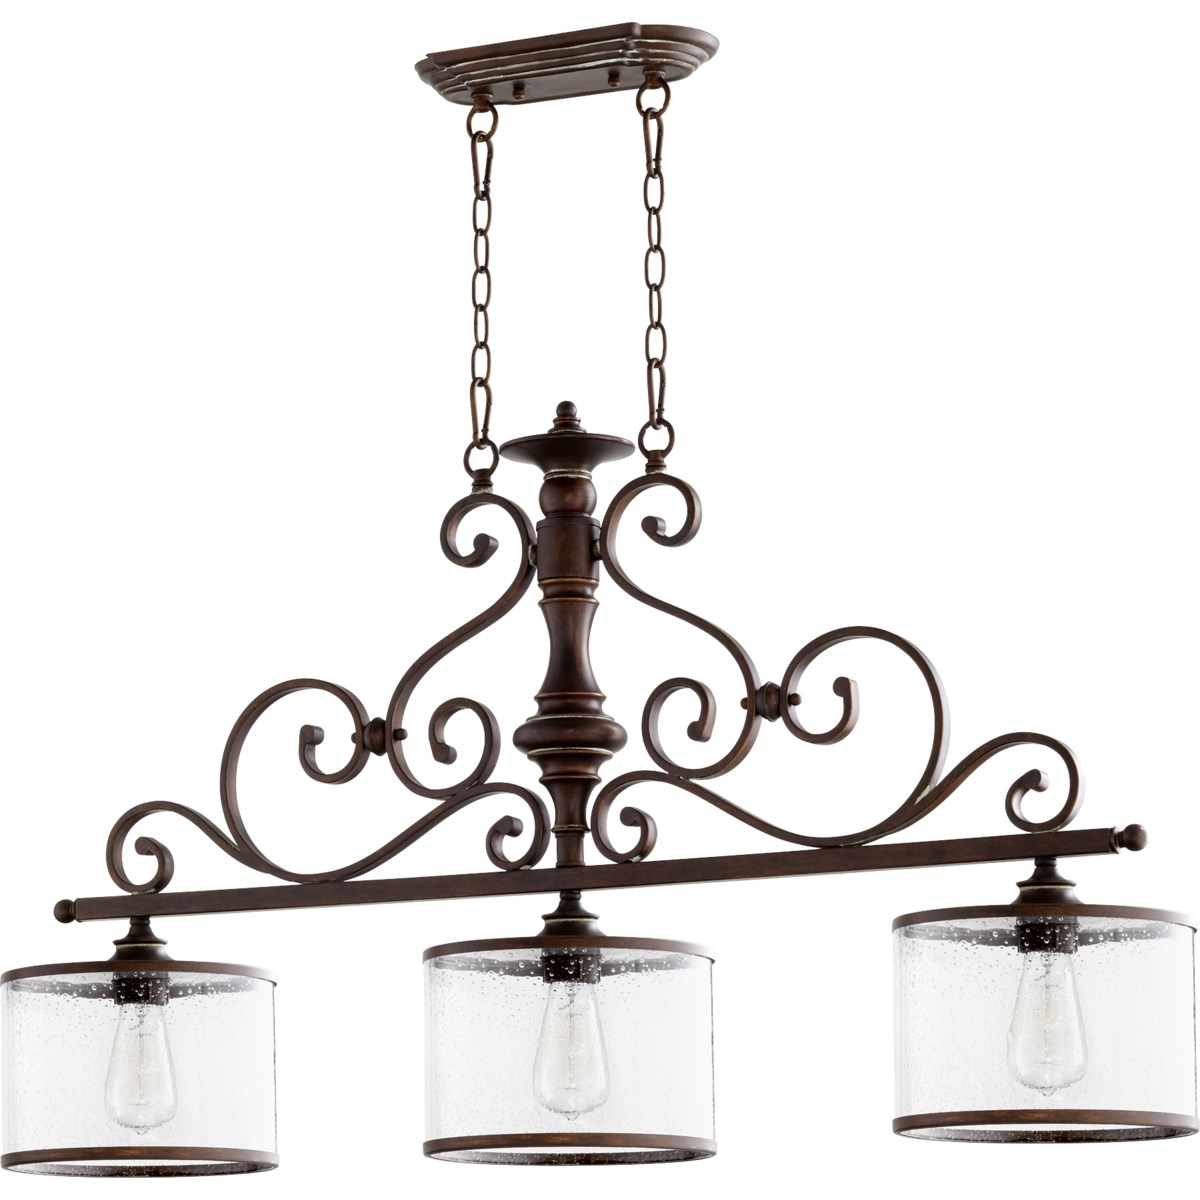 San Miguel 3 Light Traditional Vintage Copper Linear Pendant